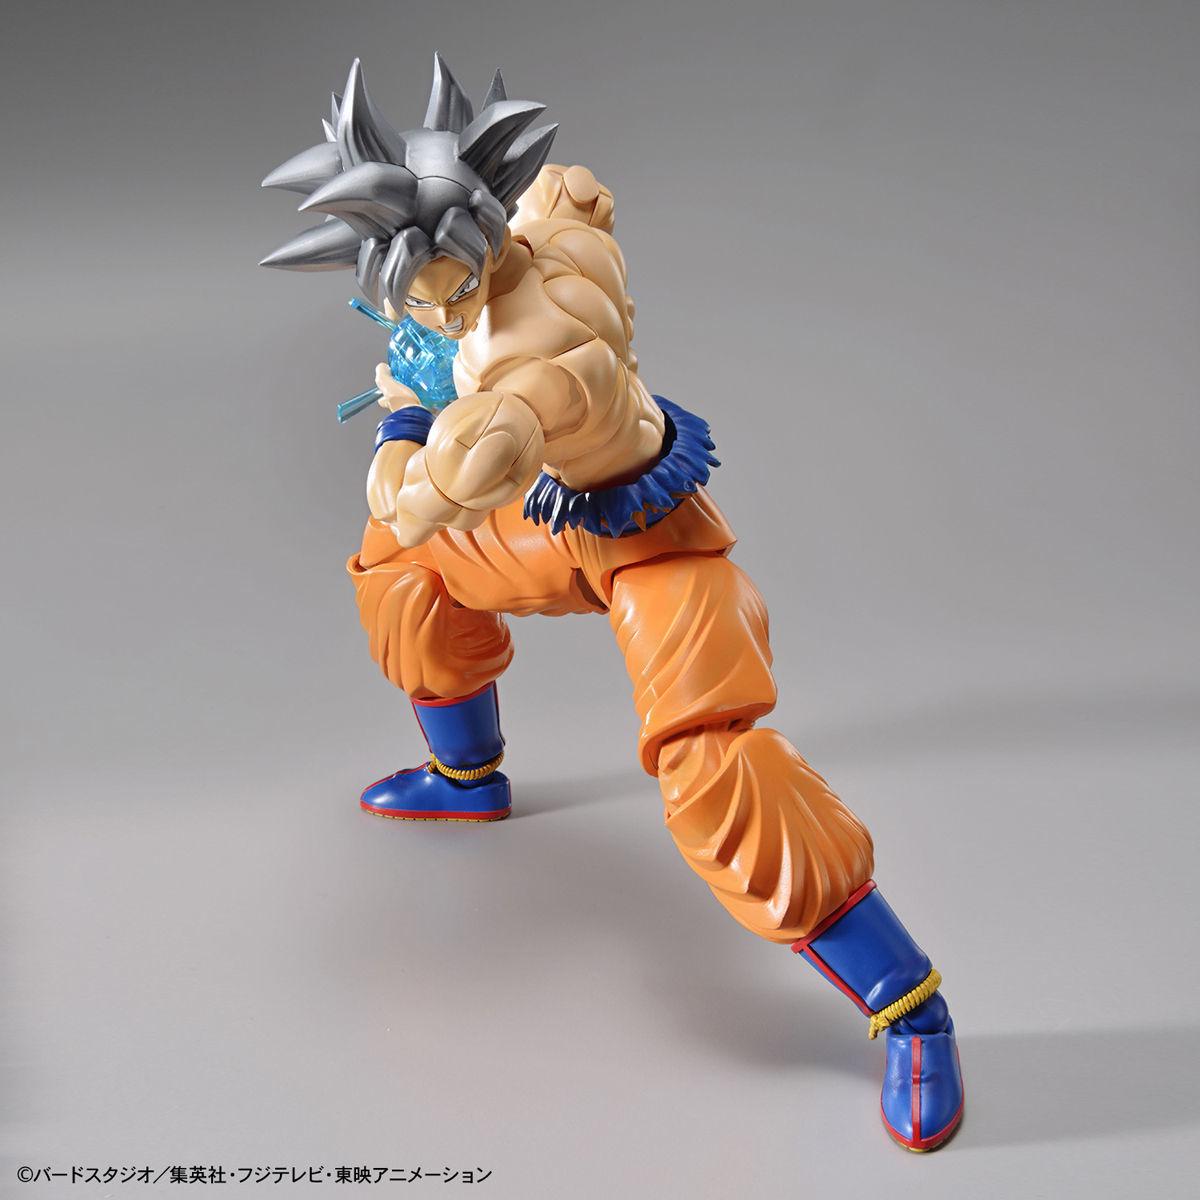 Figure-rise Standard Son Goku (Ultra Instinct) - Model Kit image